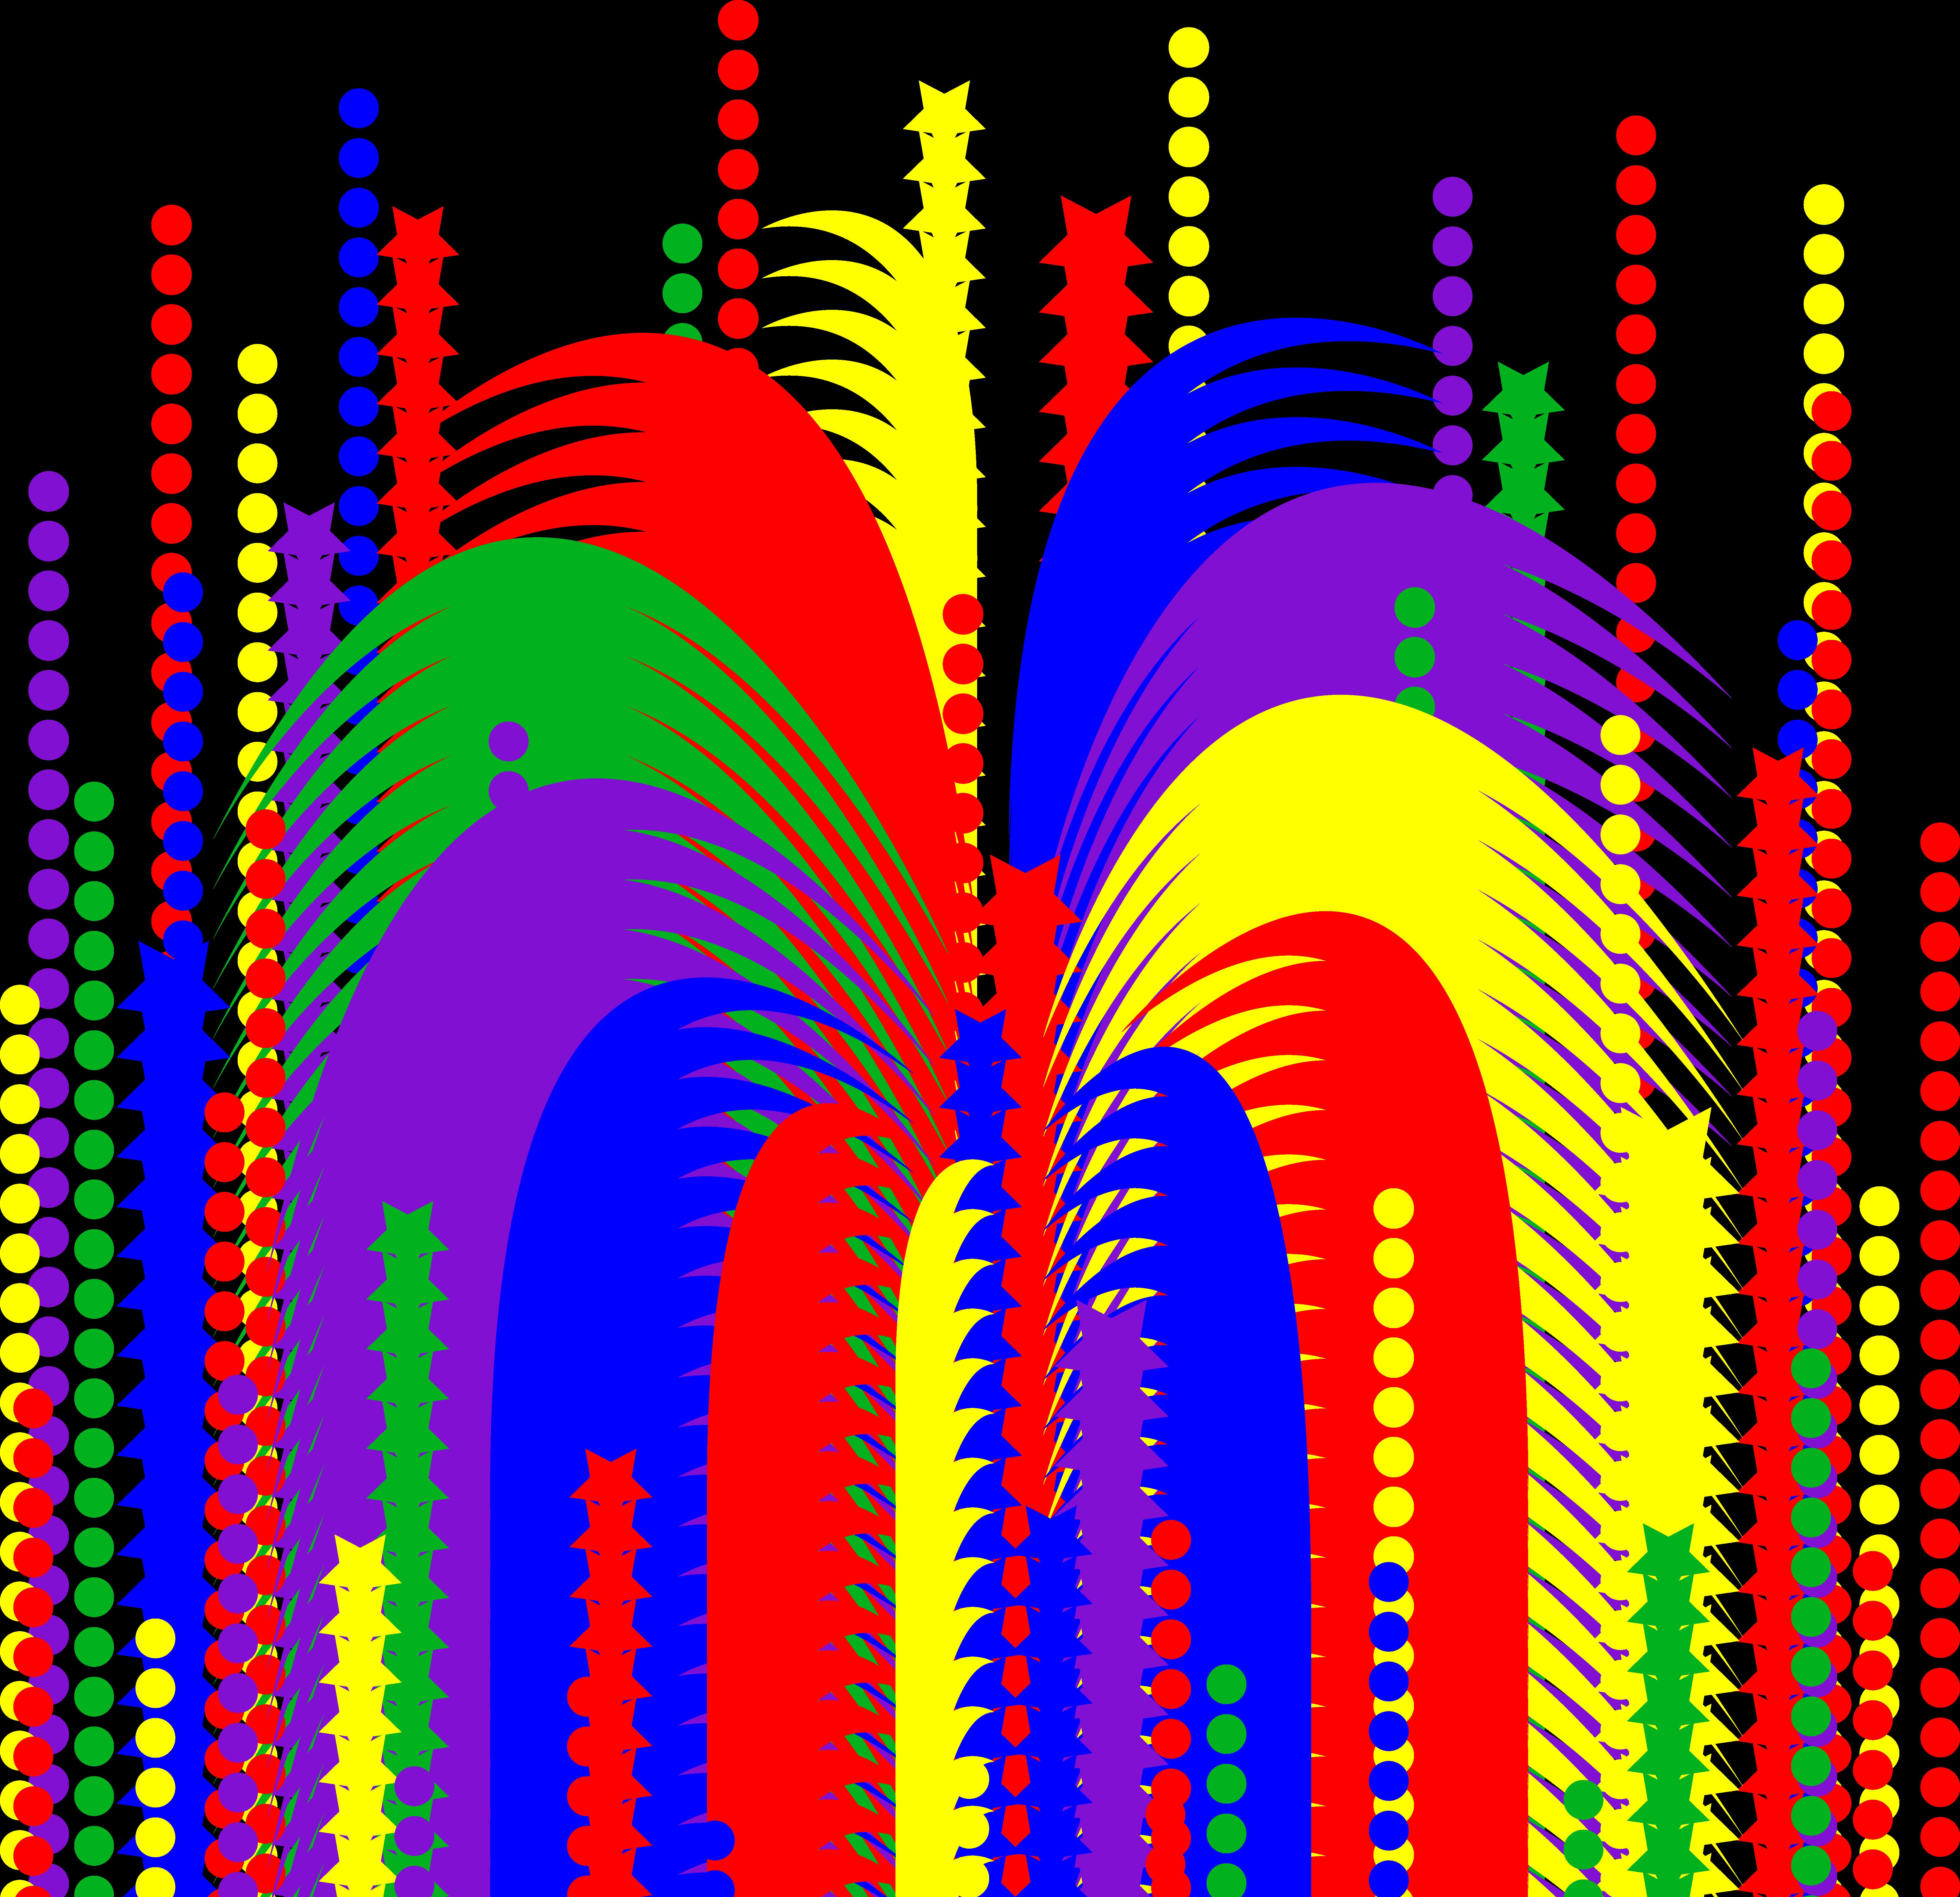 7175x6943 Confetti Fireworks Clipart, Explore Pictures